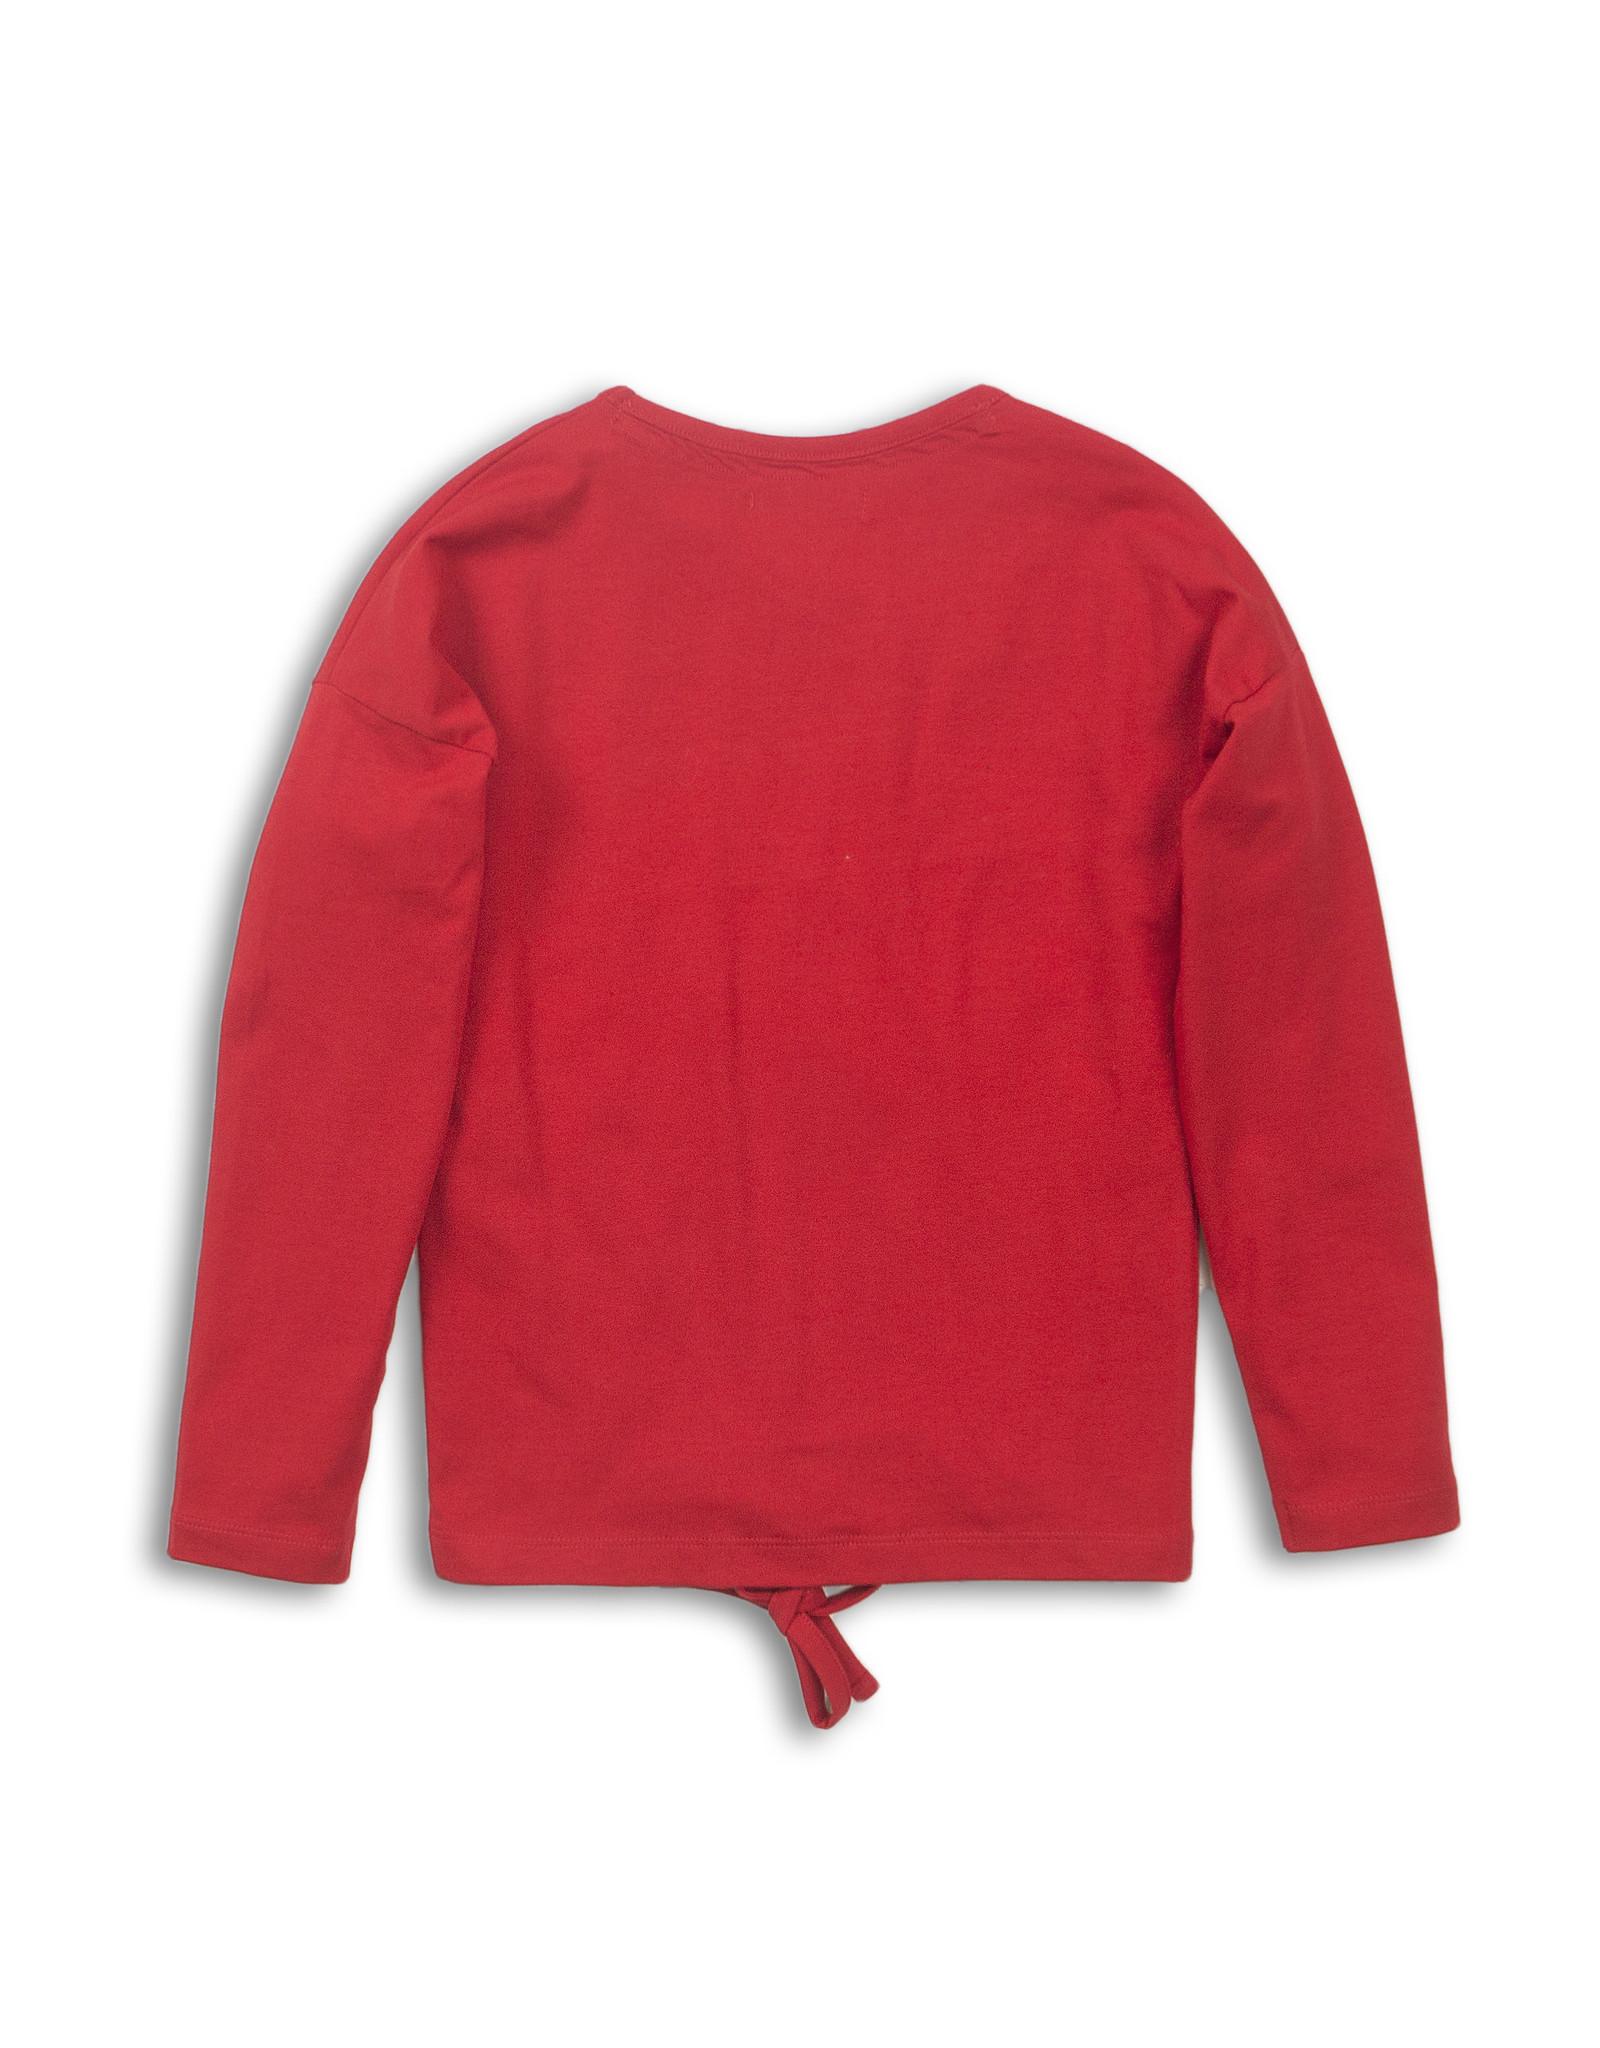 DJ Dutchjeans DJ Dutchjeans meisjes shirt Heart Red